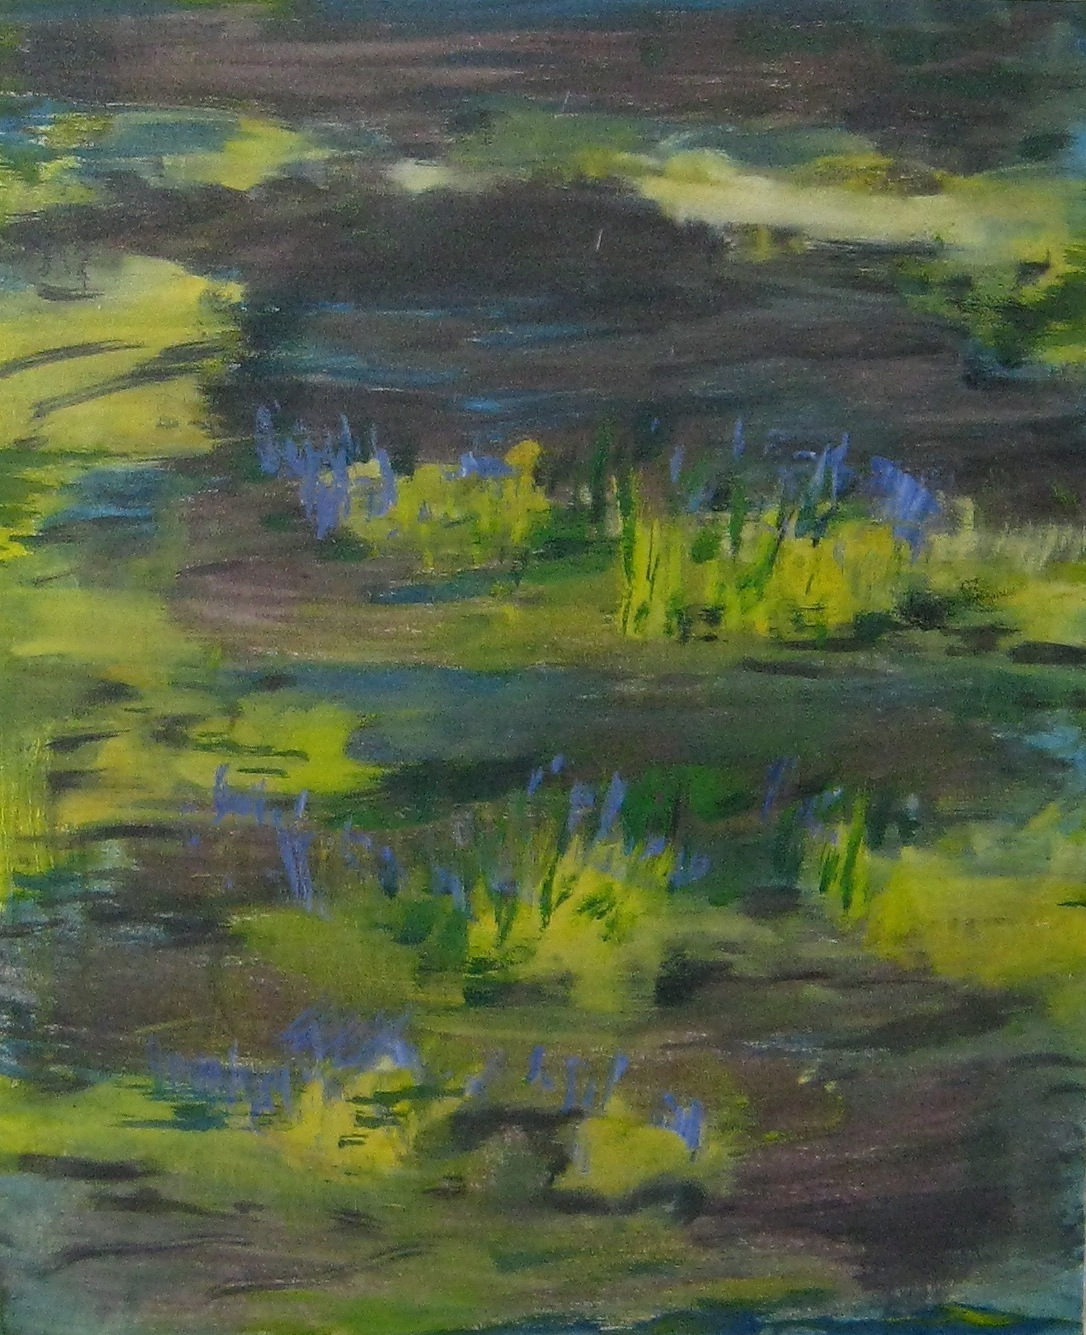 Imagined Landscape, 2011